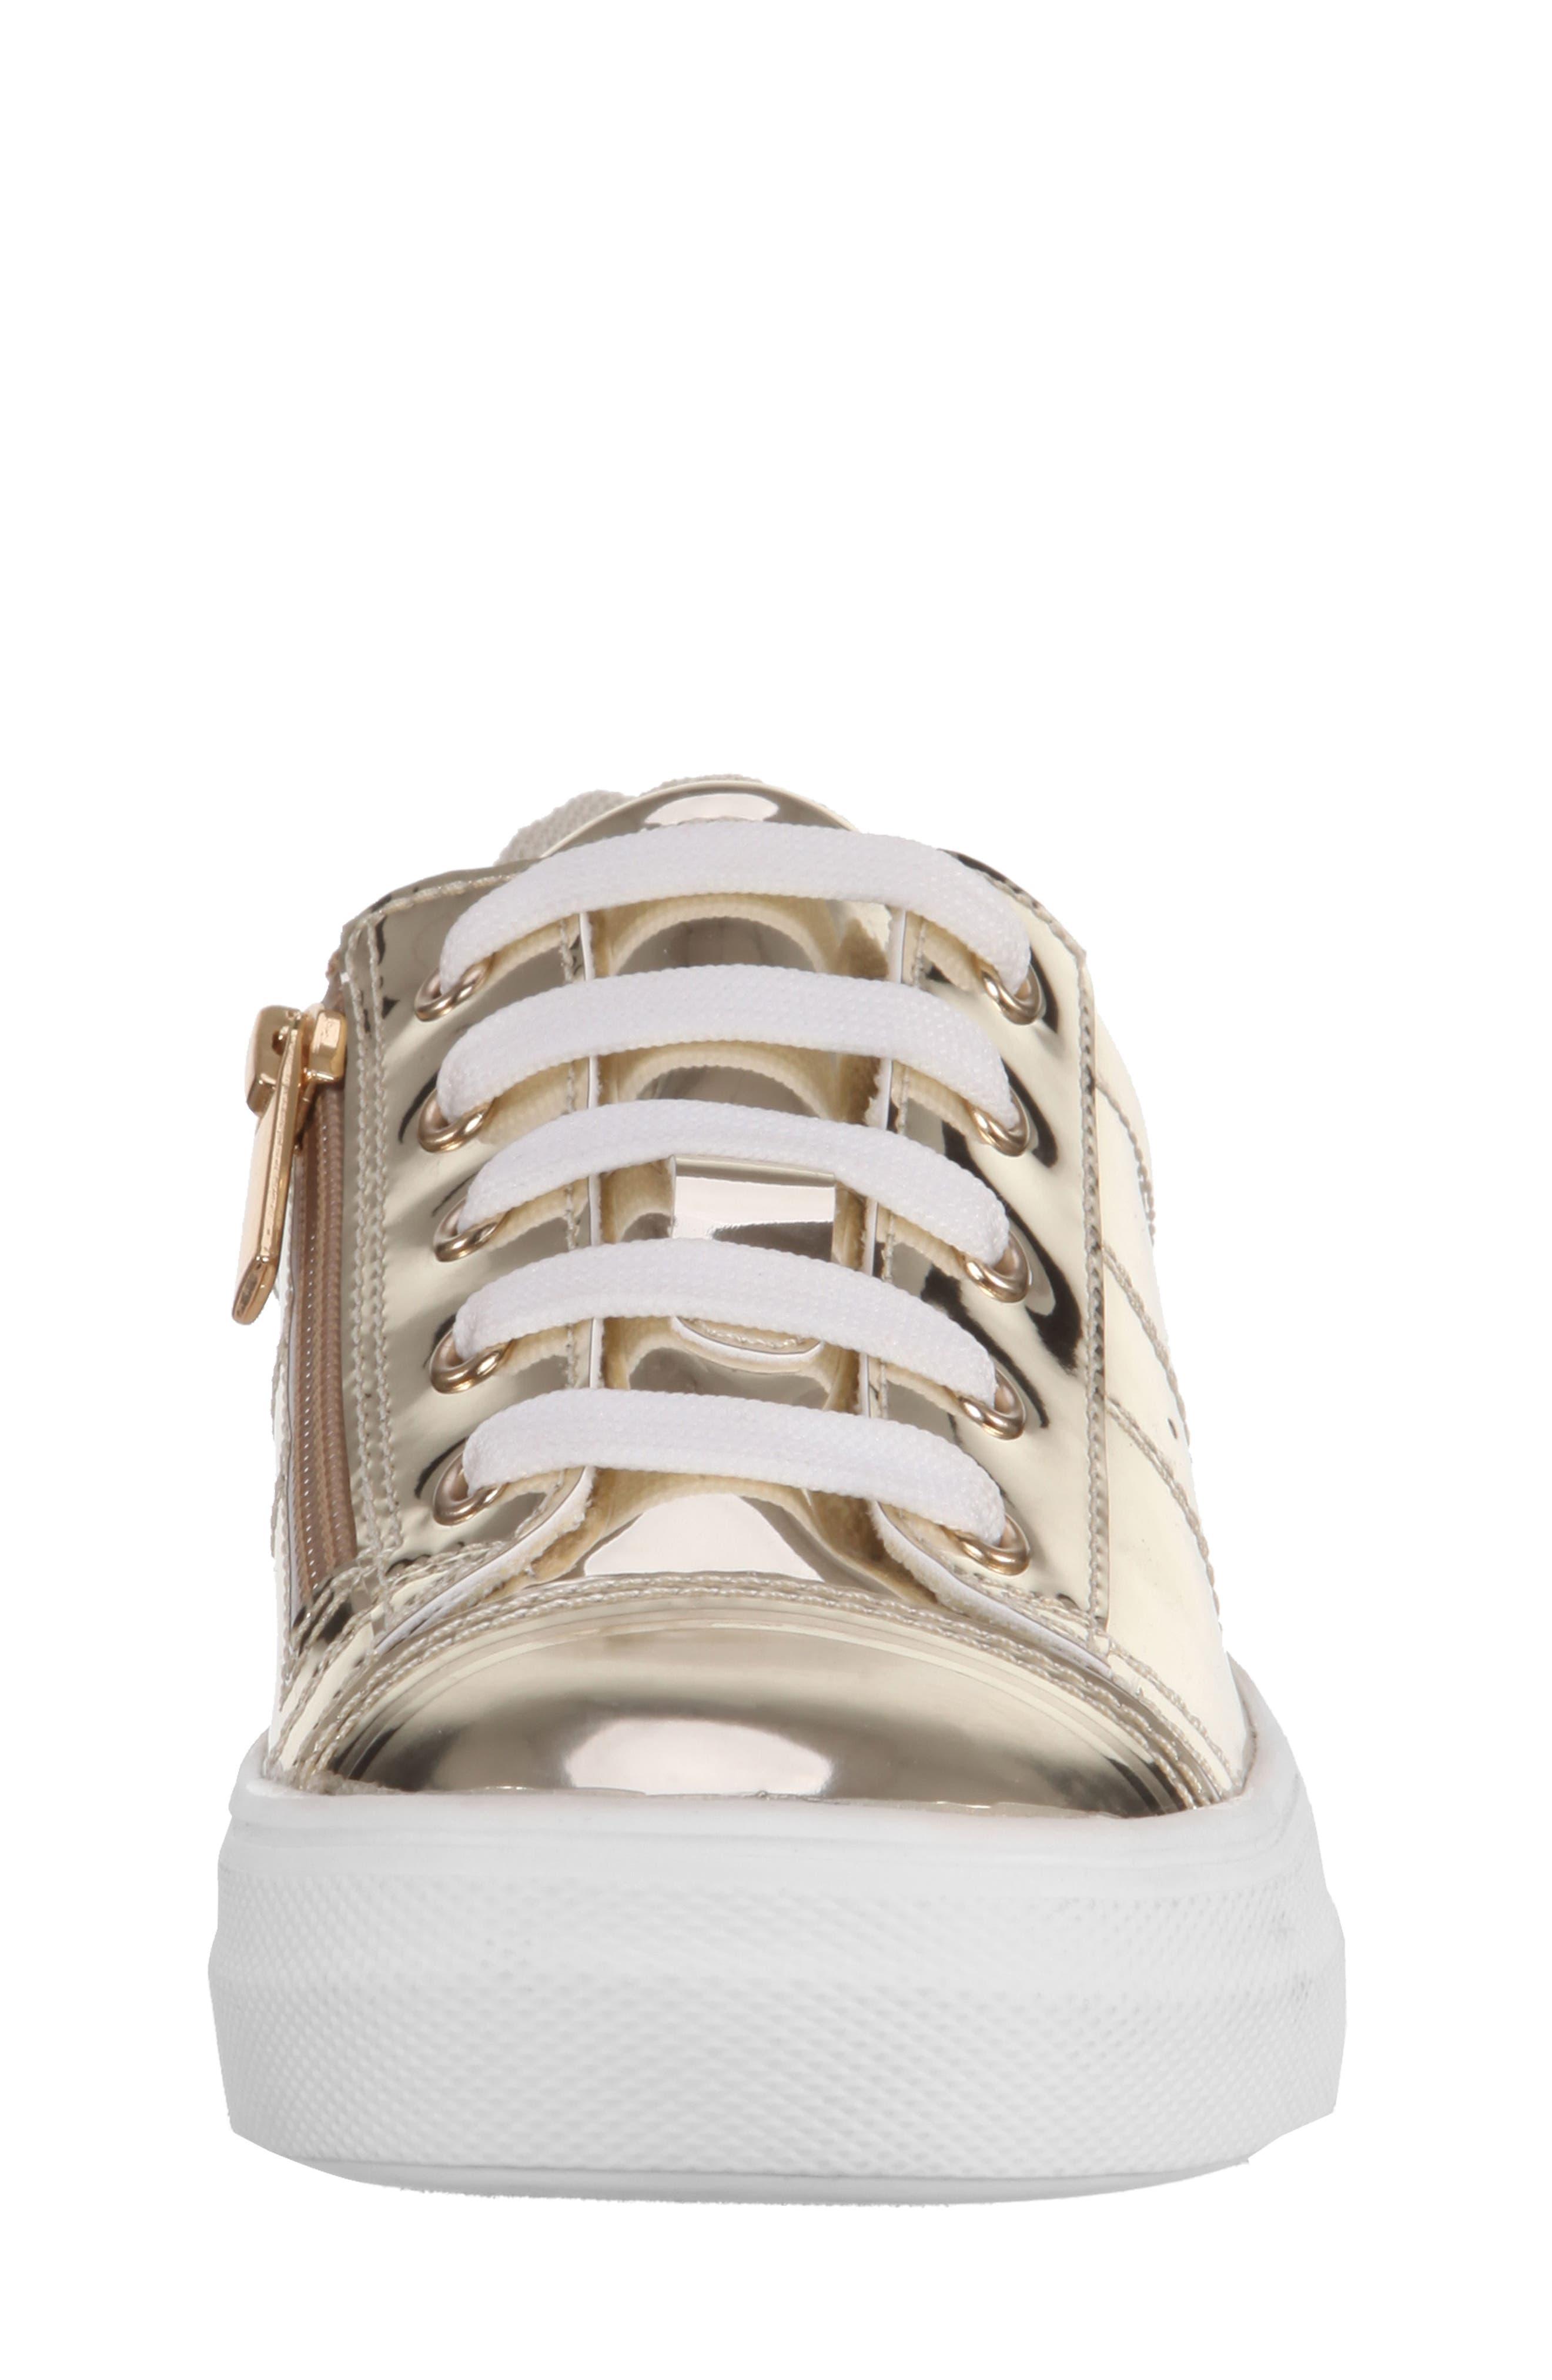 Rochella Metallic Sneaker,                             Alternate thumbnail 4, color,                             Platino Mirror Metallic